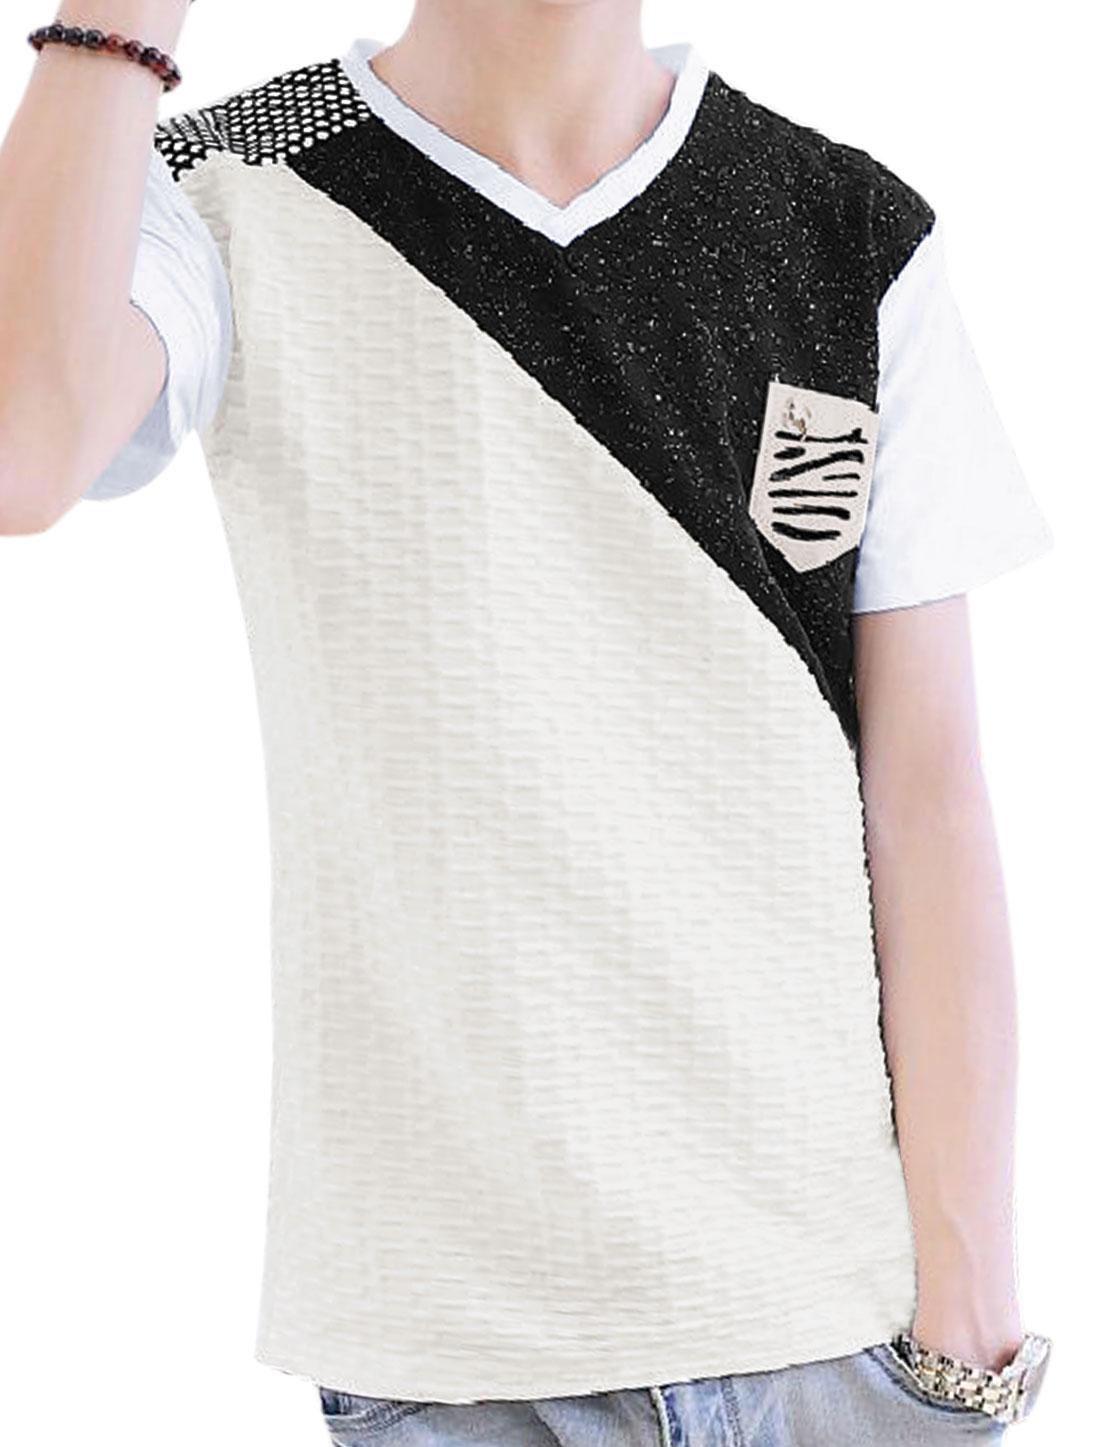 Men V Neck Imitation Leather Chest Pocket Leisure T-Shirt White S